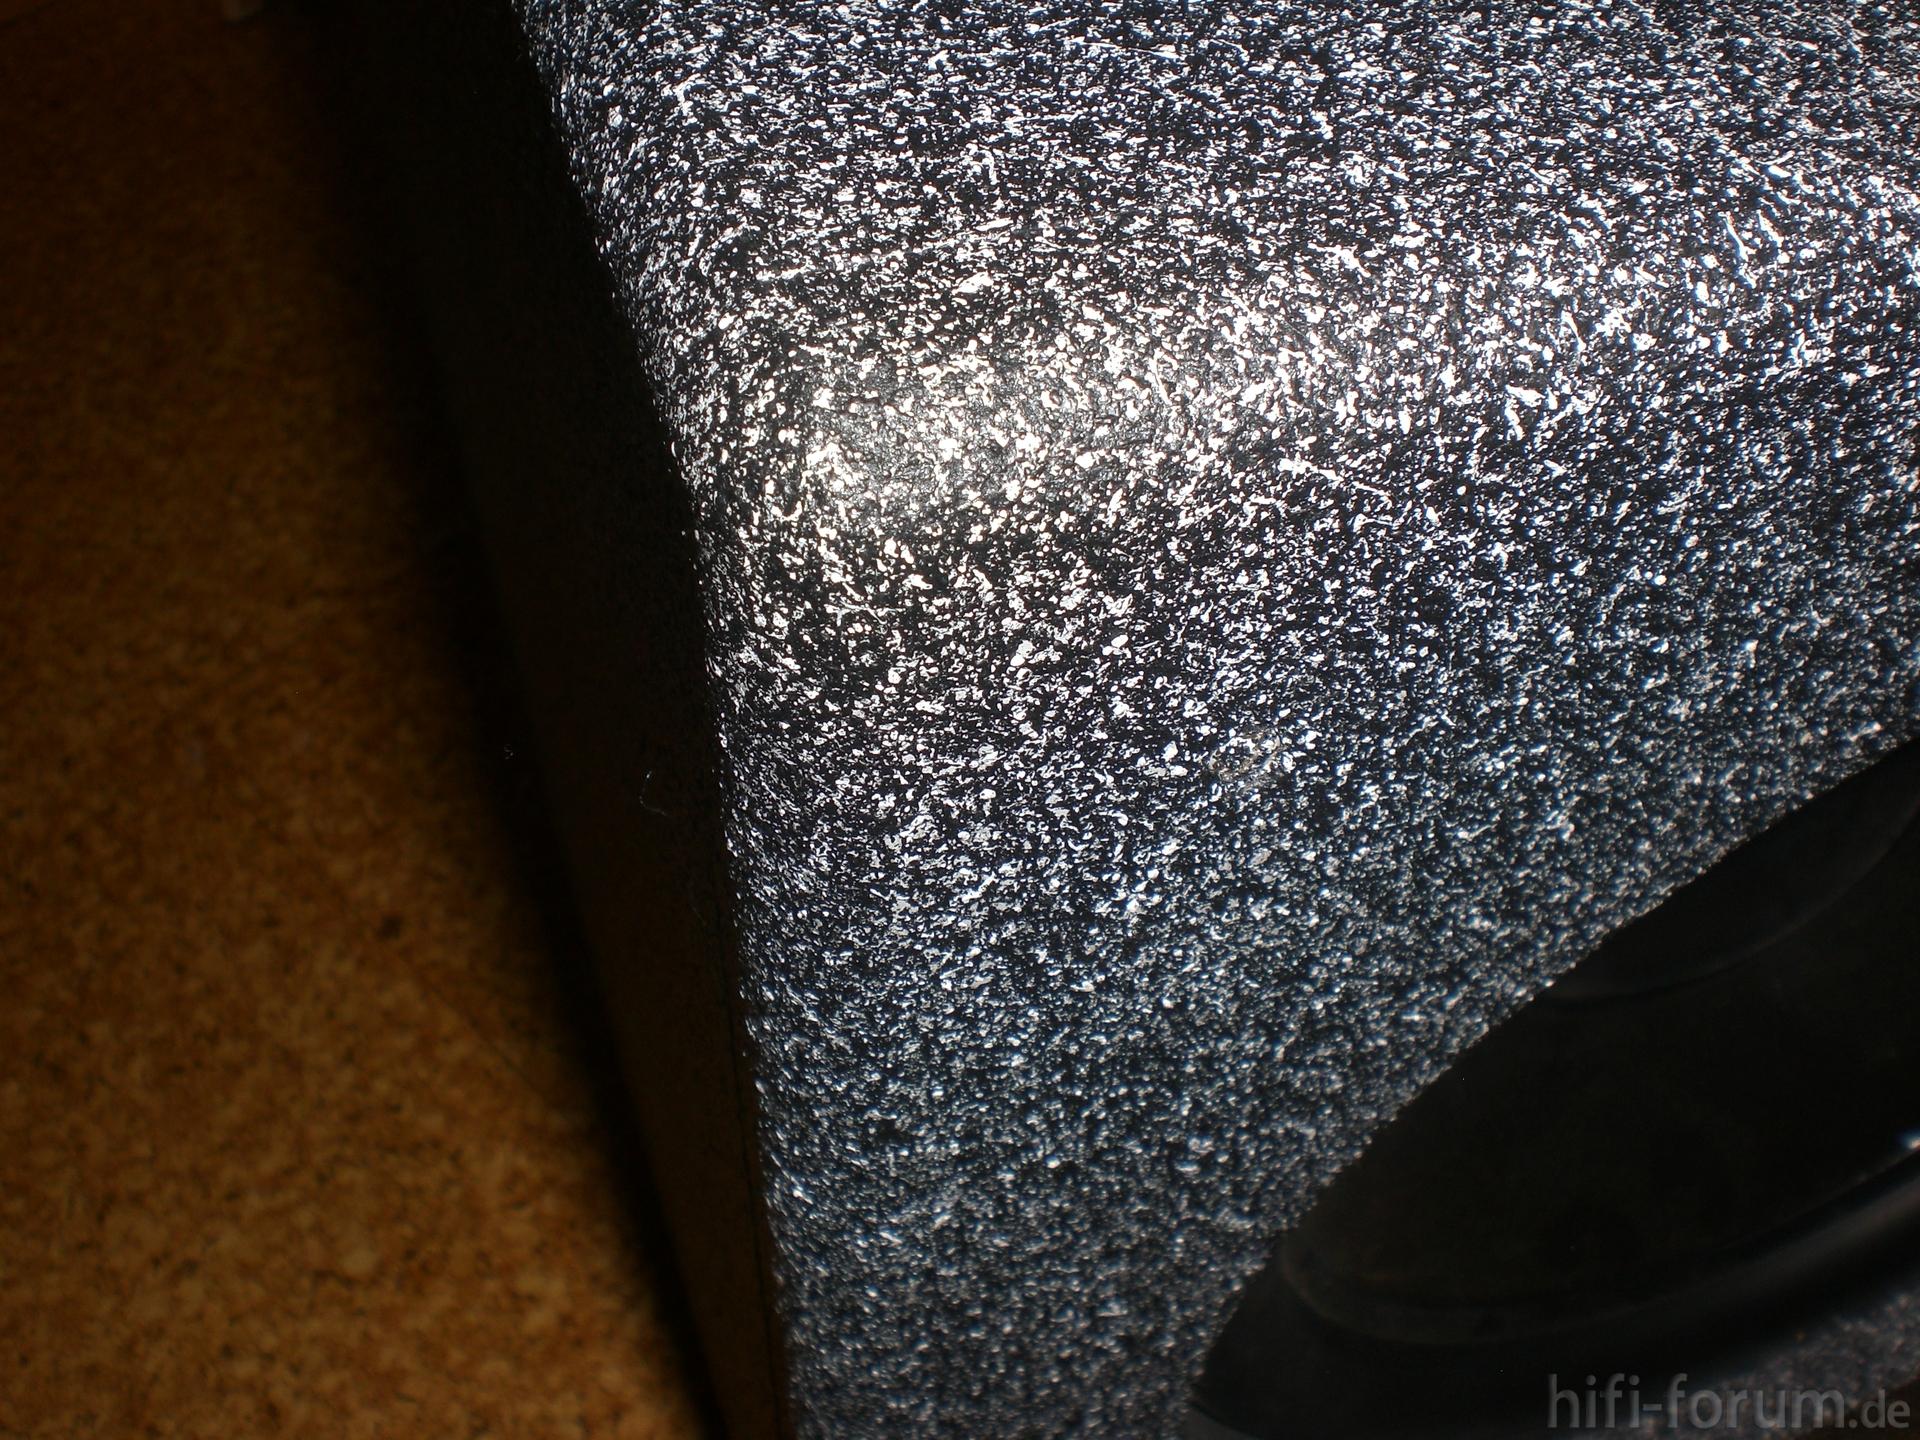 cimg9011 doityourself hifi bildergalerie. Black Bedroom Furniture Sets. Home Design Ideas